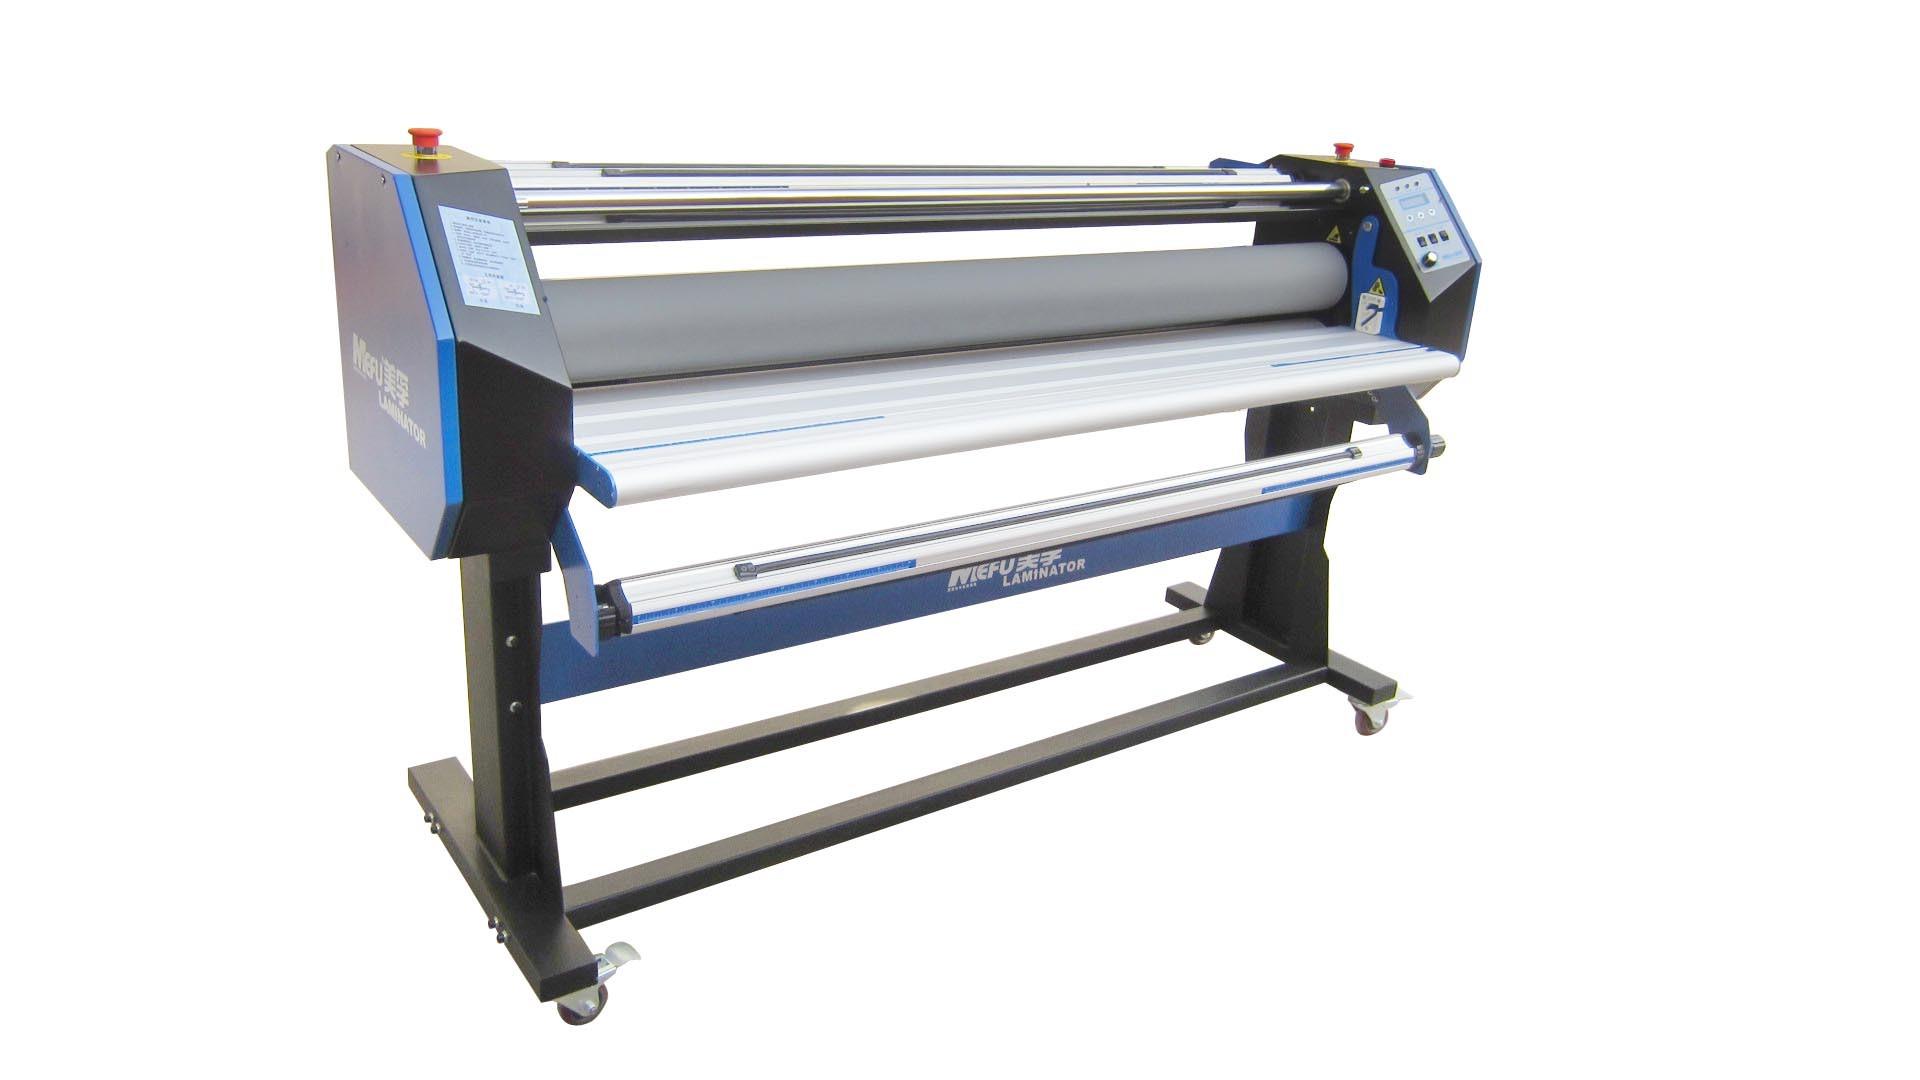 MEFU MF1700M5 Warm Roll Cold Laminator for Manual Lamination